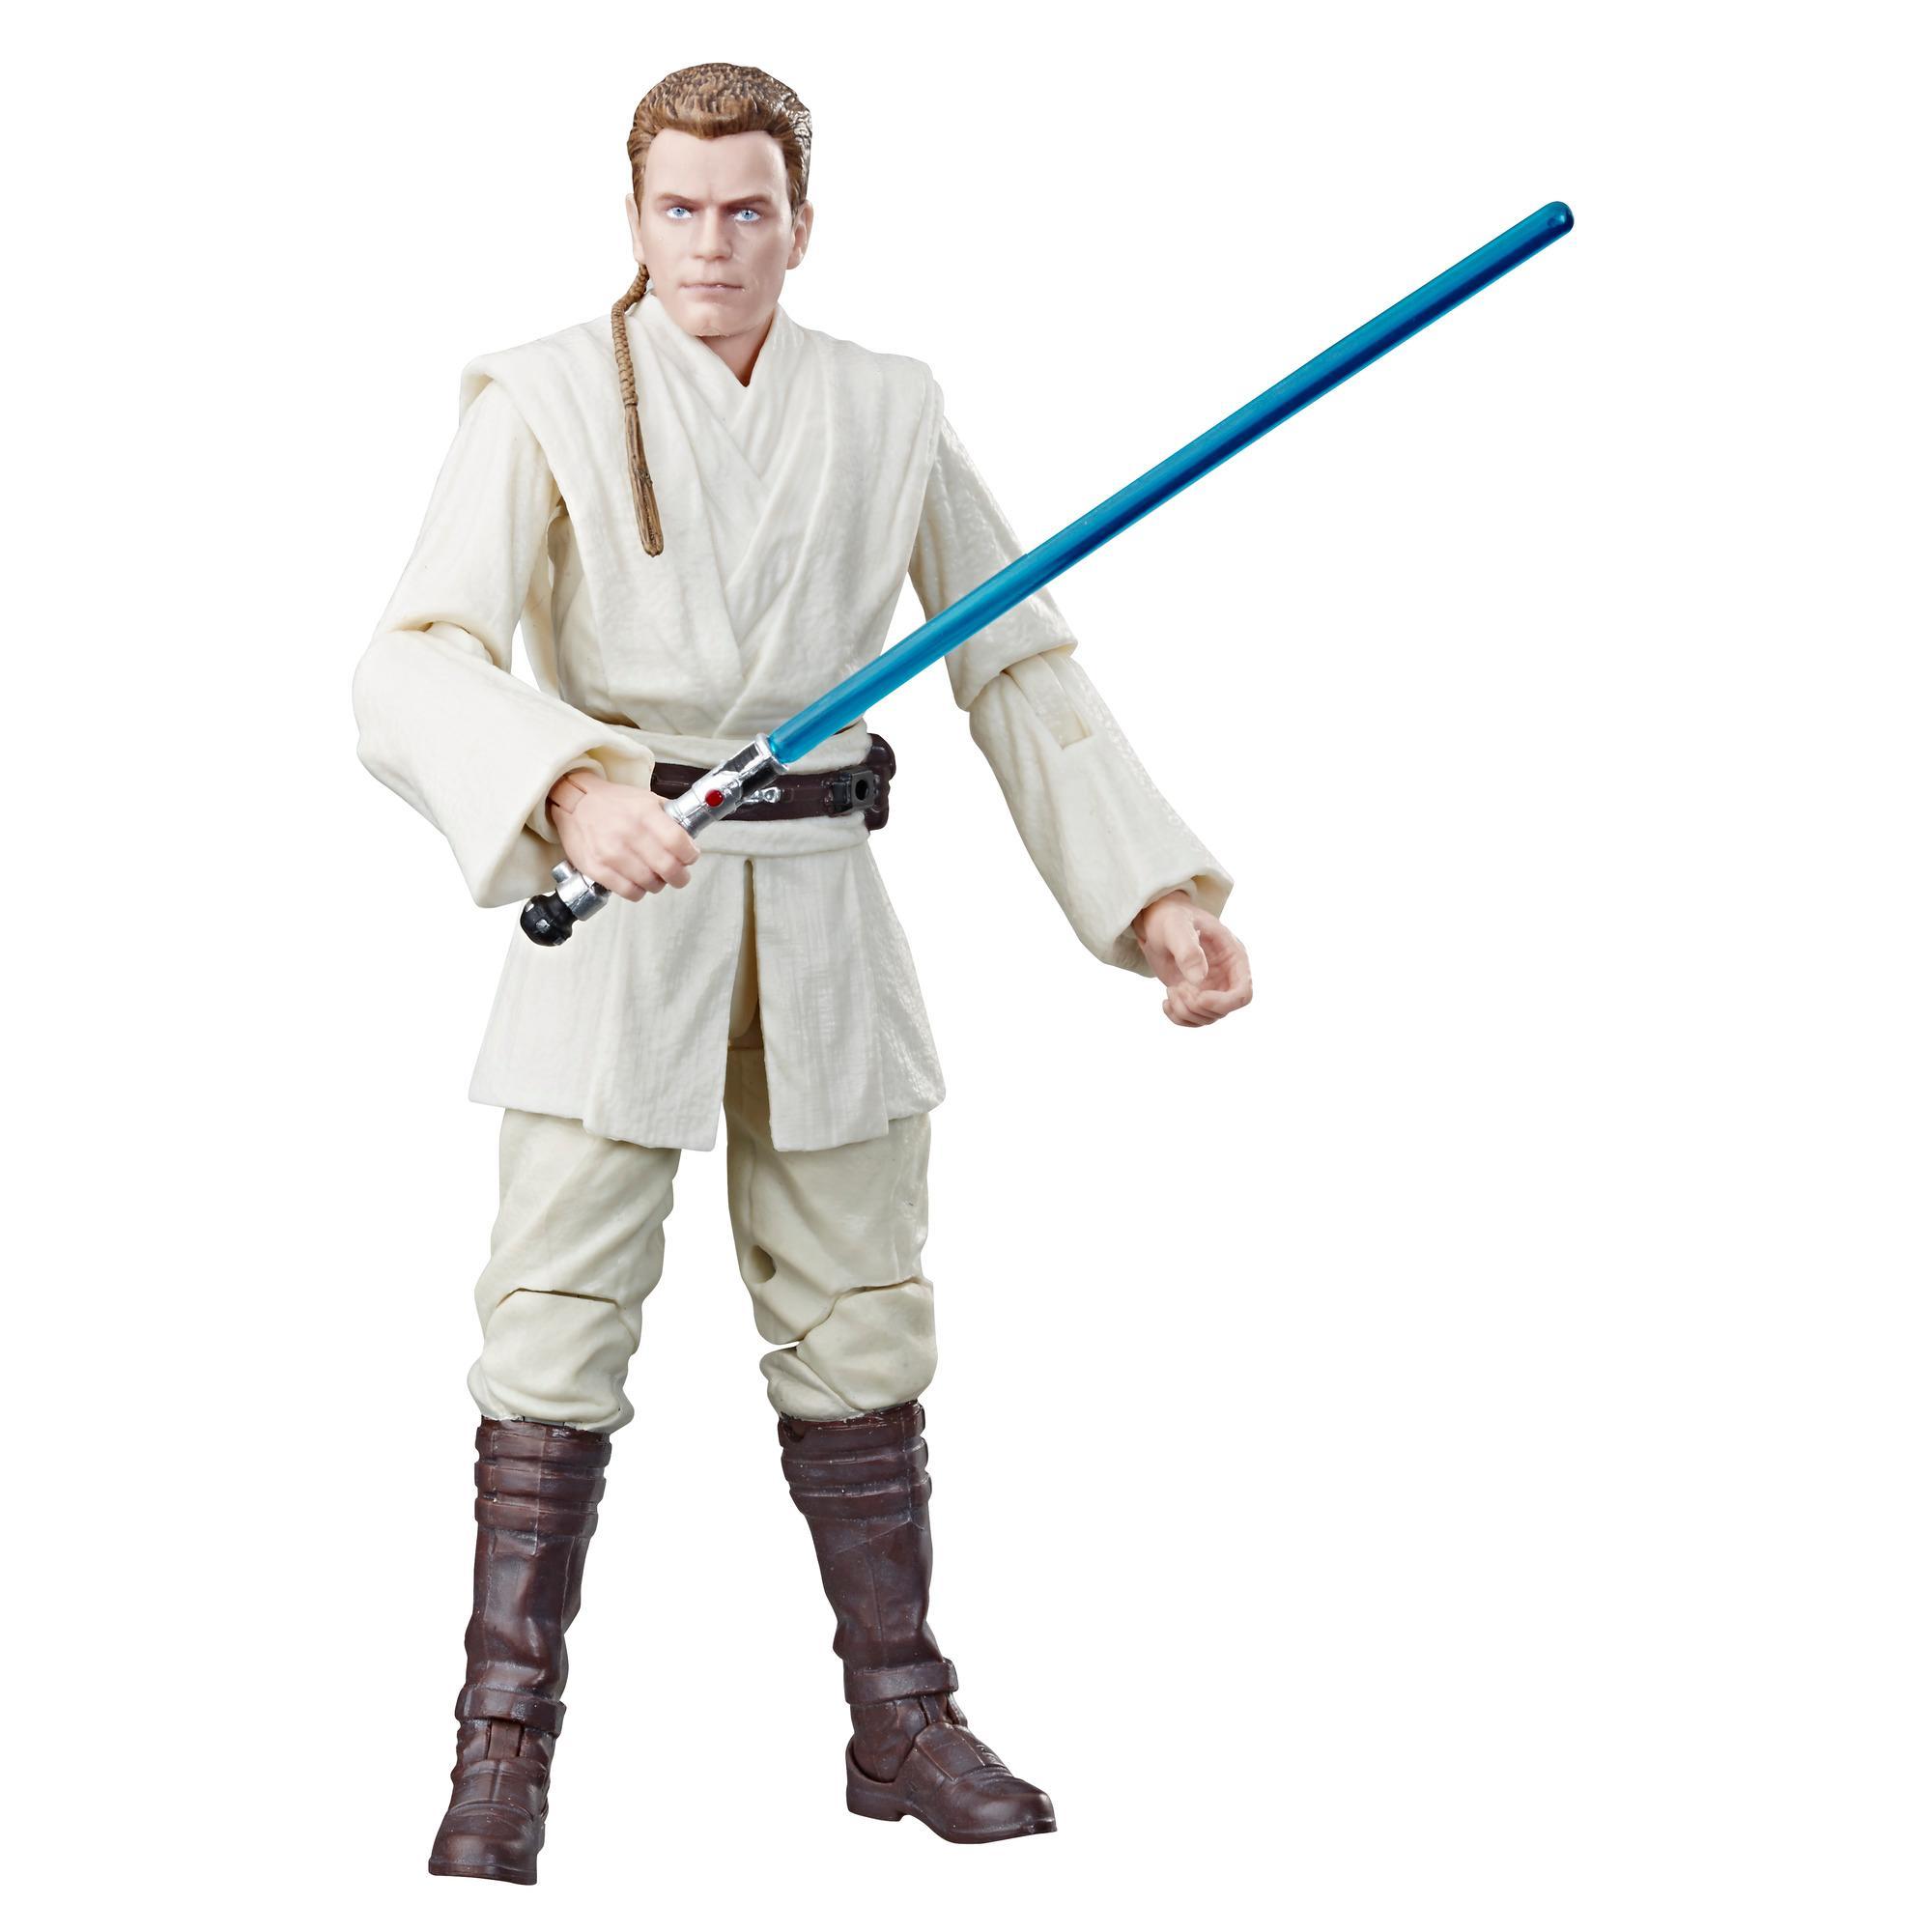 Star Wars The Black Series Star Wars Episode 1: The Phantom Menace 6-Inch-Scale Obi-Wan Kenobi Figure